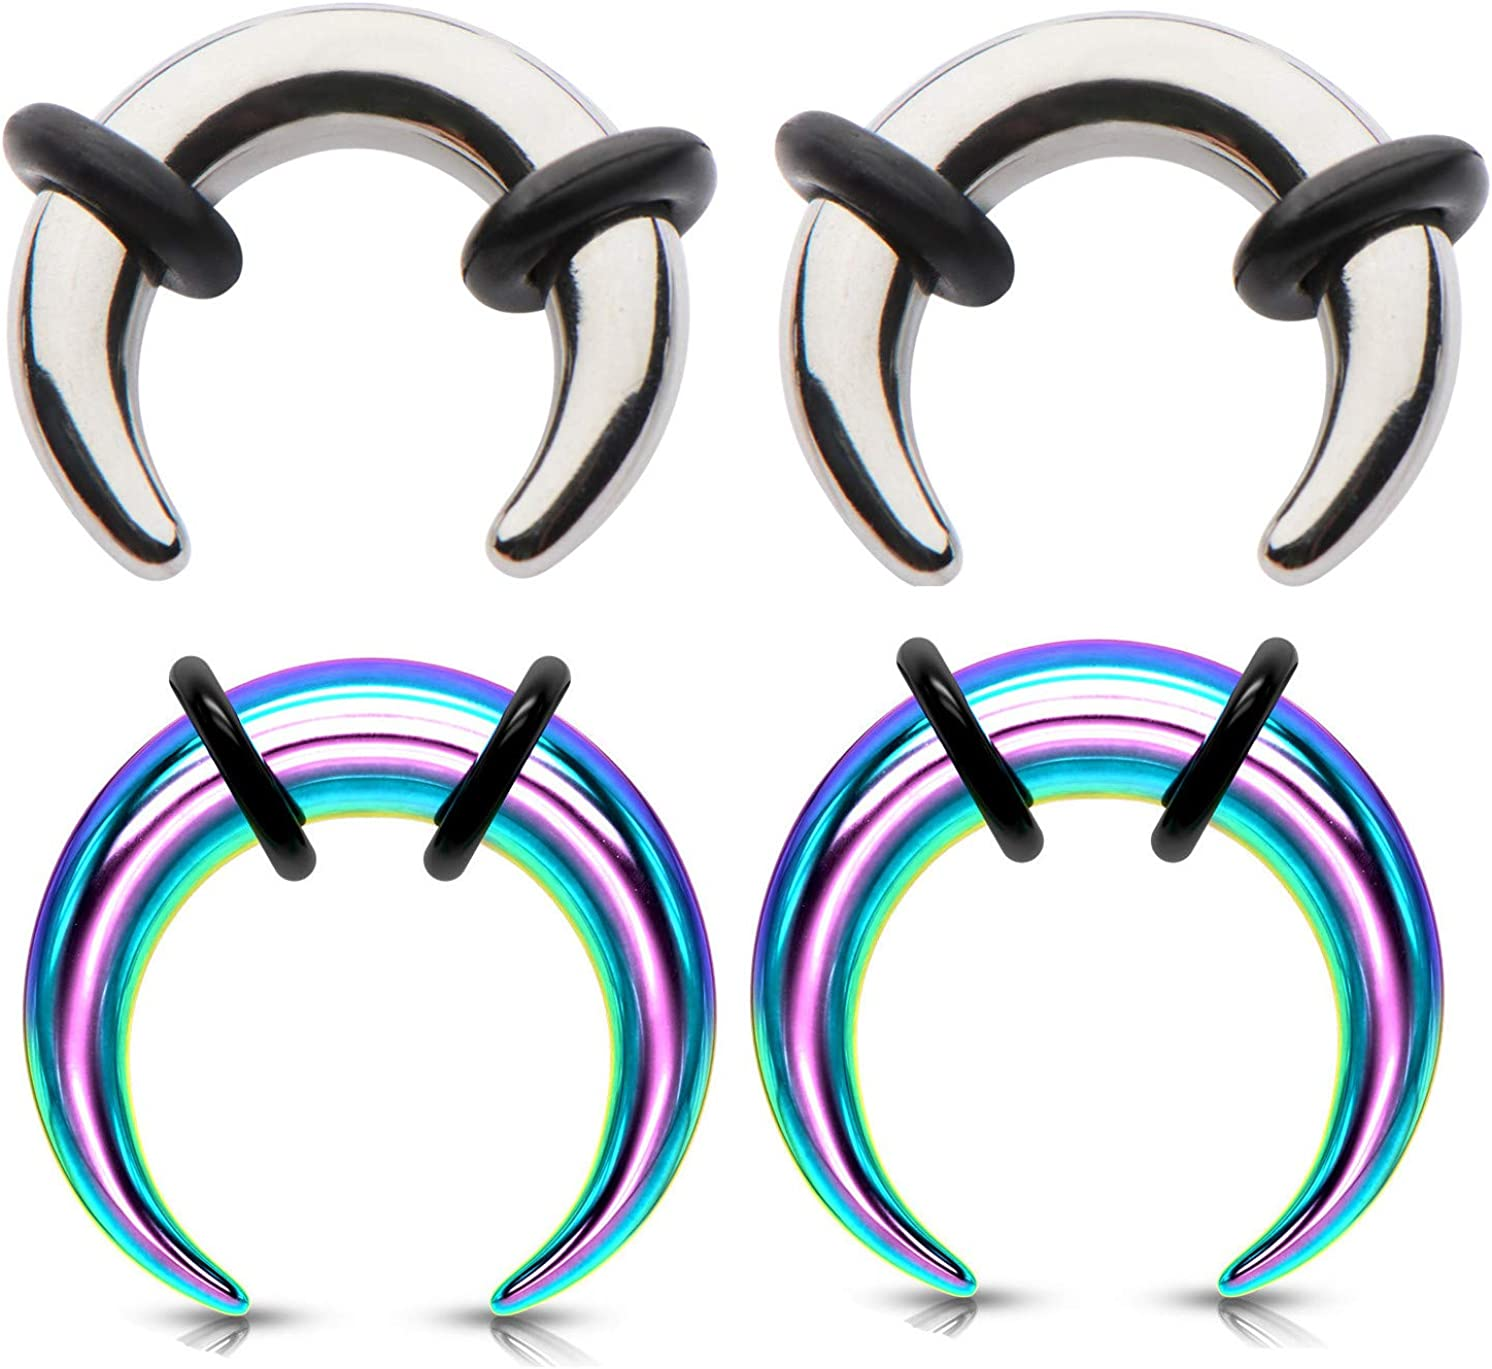 Zaya Body Jewelry 2 Pairs Steel Rainbow Ear Plugs Tapers Pinchers Horseshoes Gauges 0g 2g 4g 6g 8g 10g 12g 14g